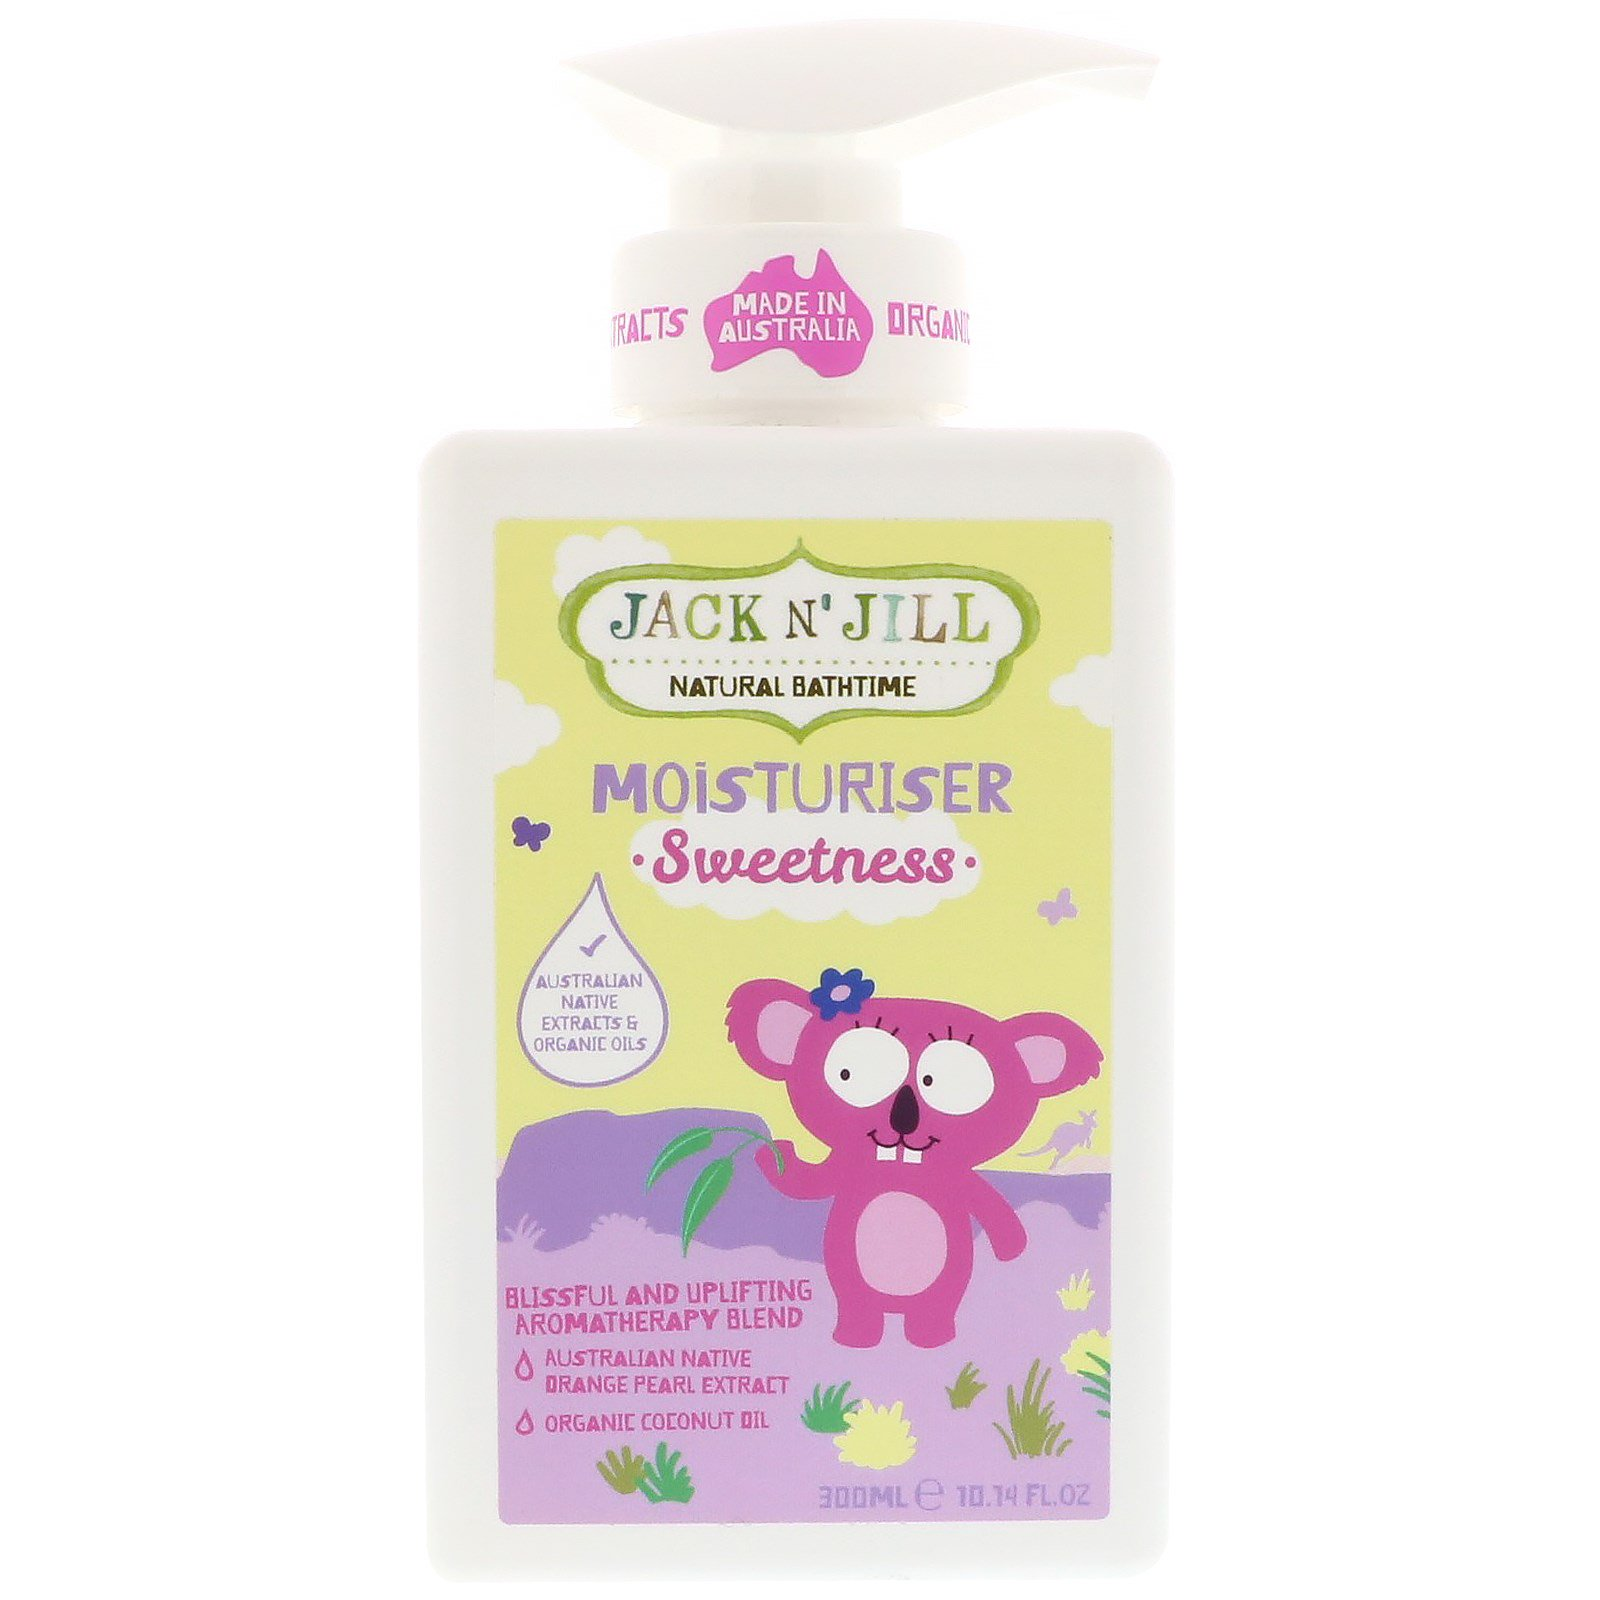 Jack n' Jill, Natural Bathtime, Moisturizer, Sweetness, 10.14 oz (300 ml)